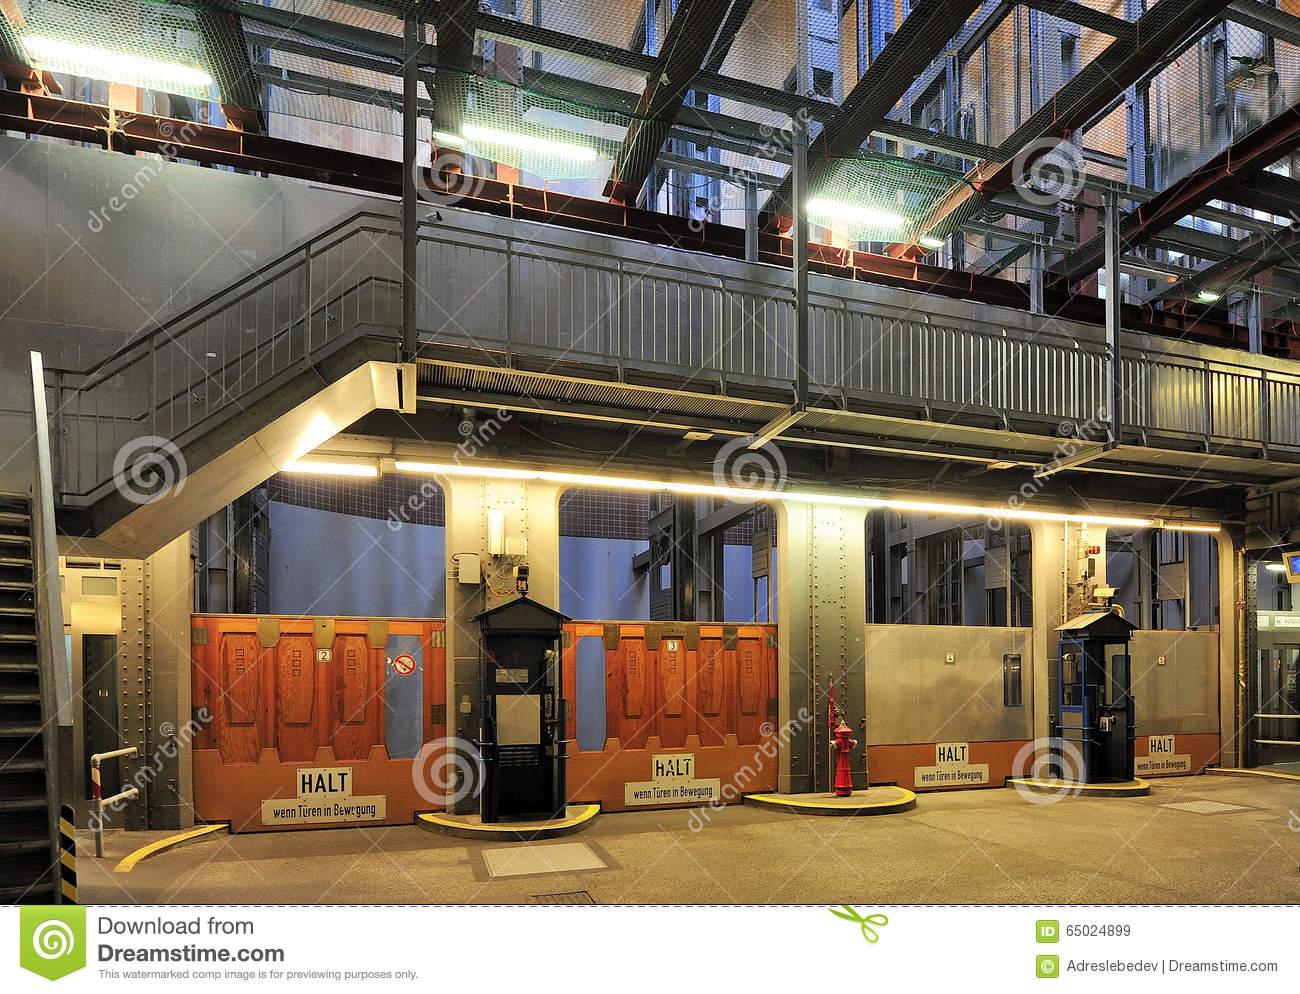 Elevators In The Old Elbe Tunnel (Elbtunnel), Hamburg, Germany.